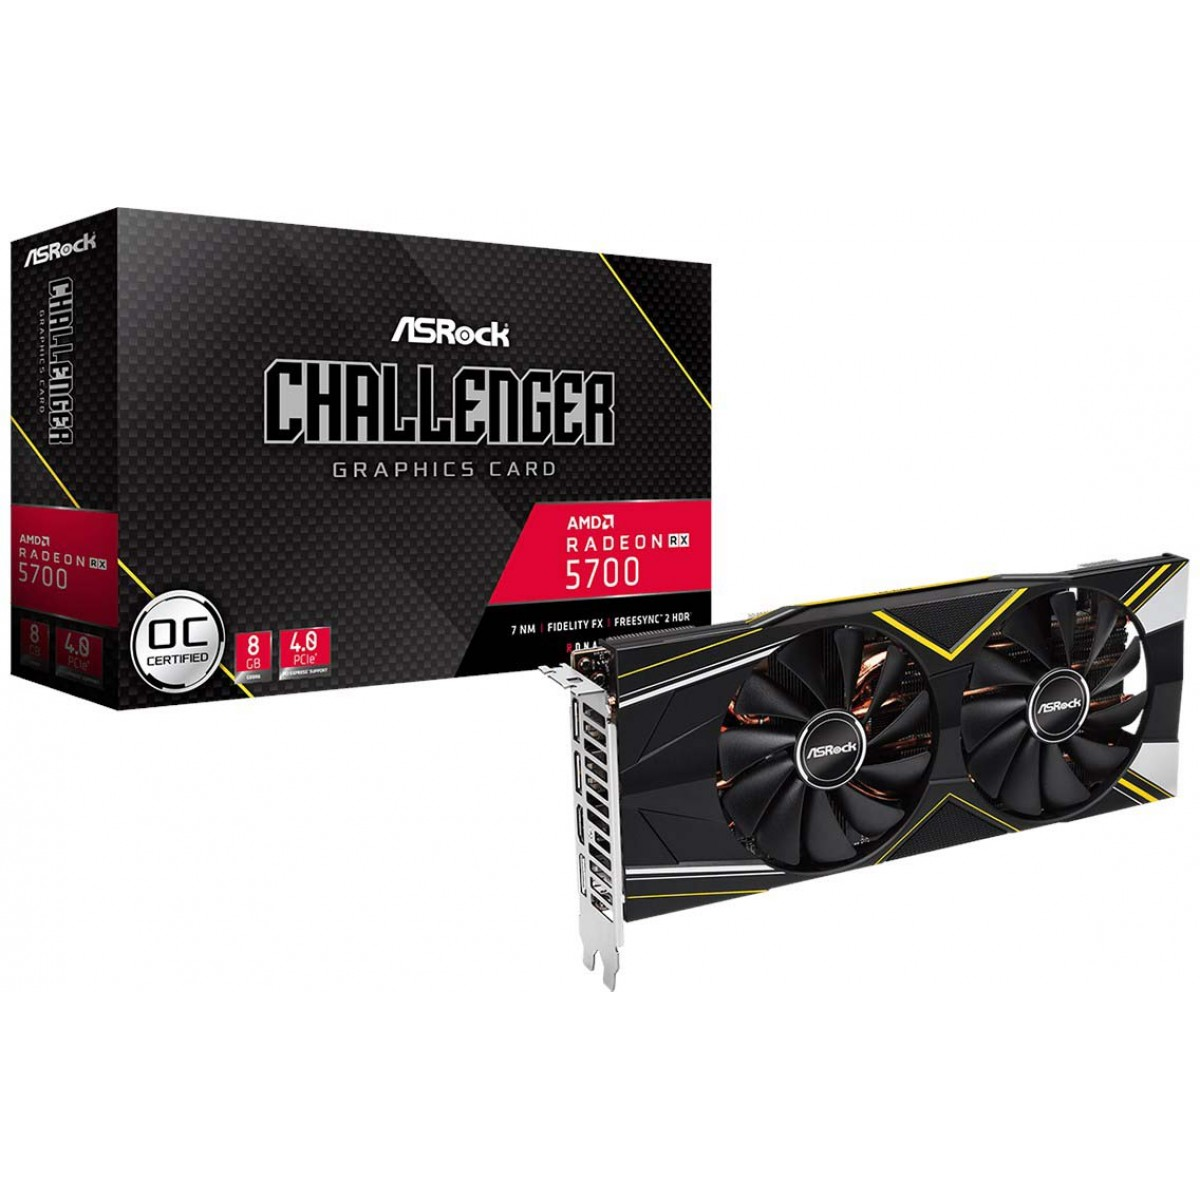 Placa de Vídeo Asrock Radeon Navi RX 5700 Challenger D, 8GB GDDR6, 256Bit, 90-GA17ZZ-00UANF